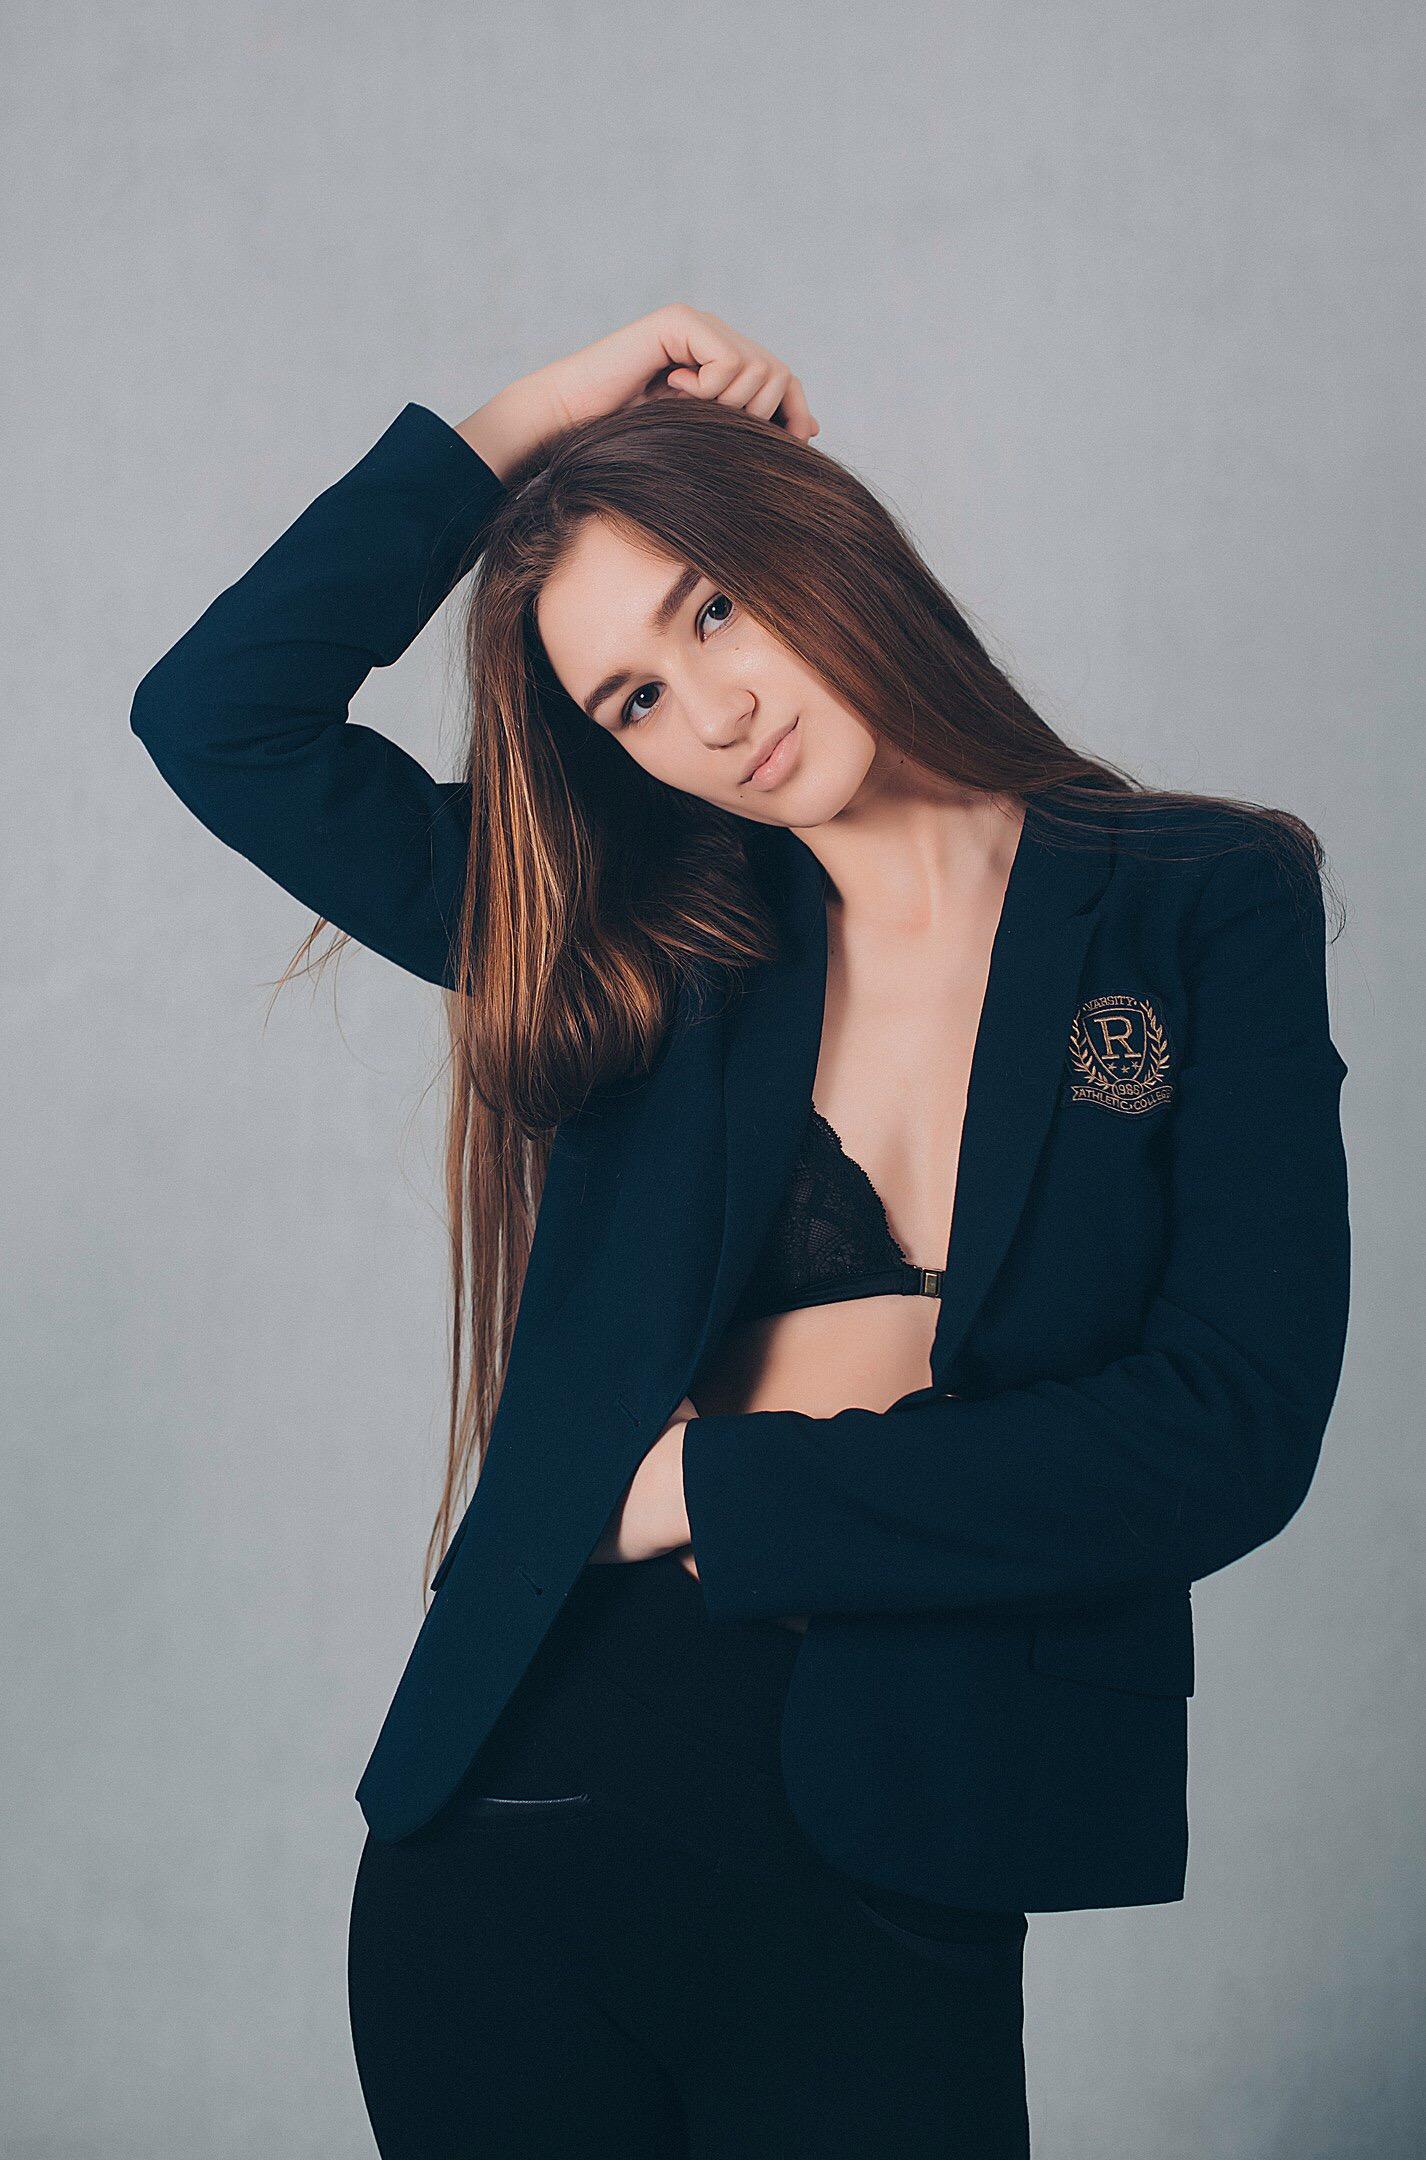 Нина иванова актриса фото сейчас спутника